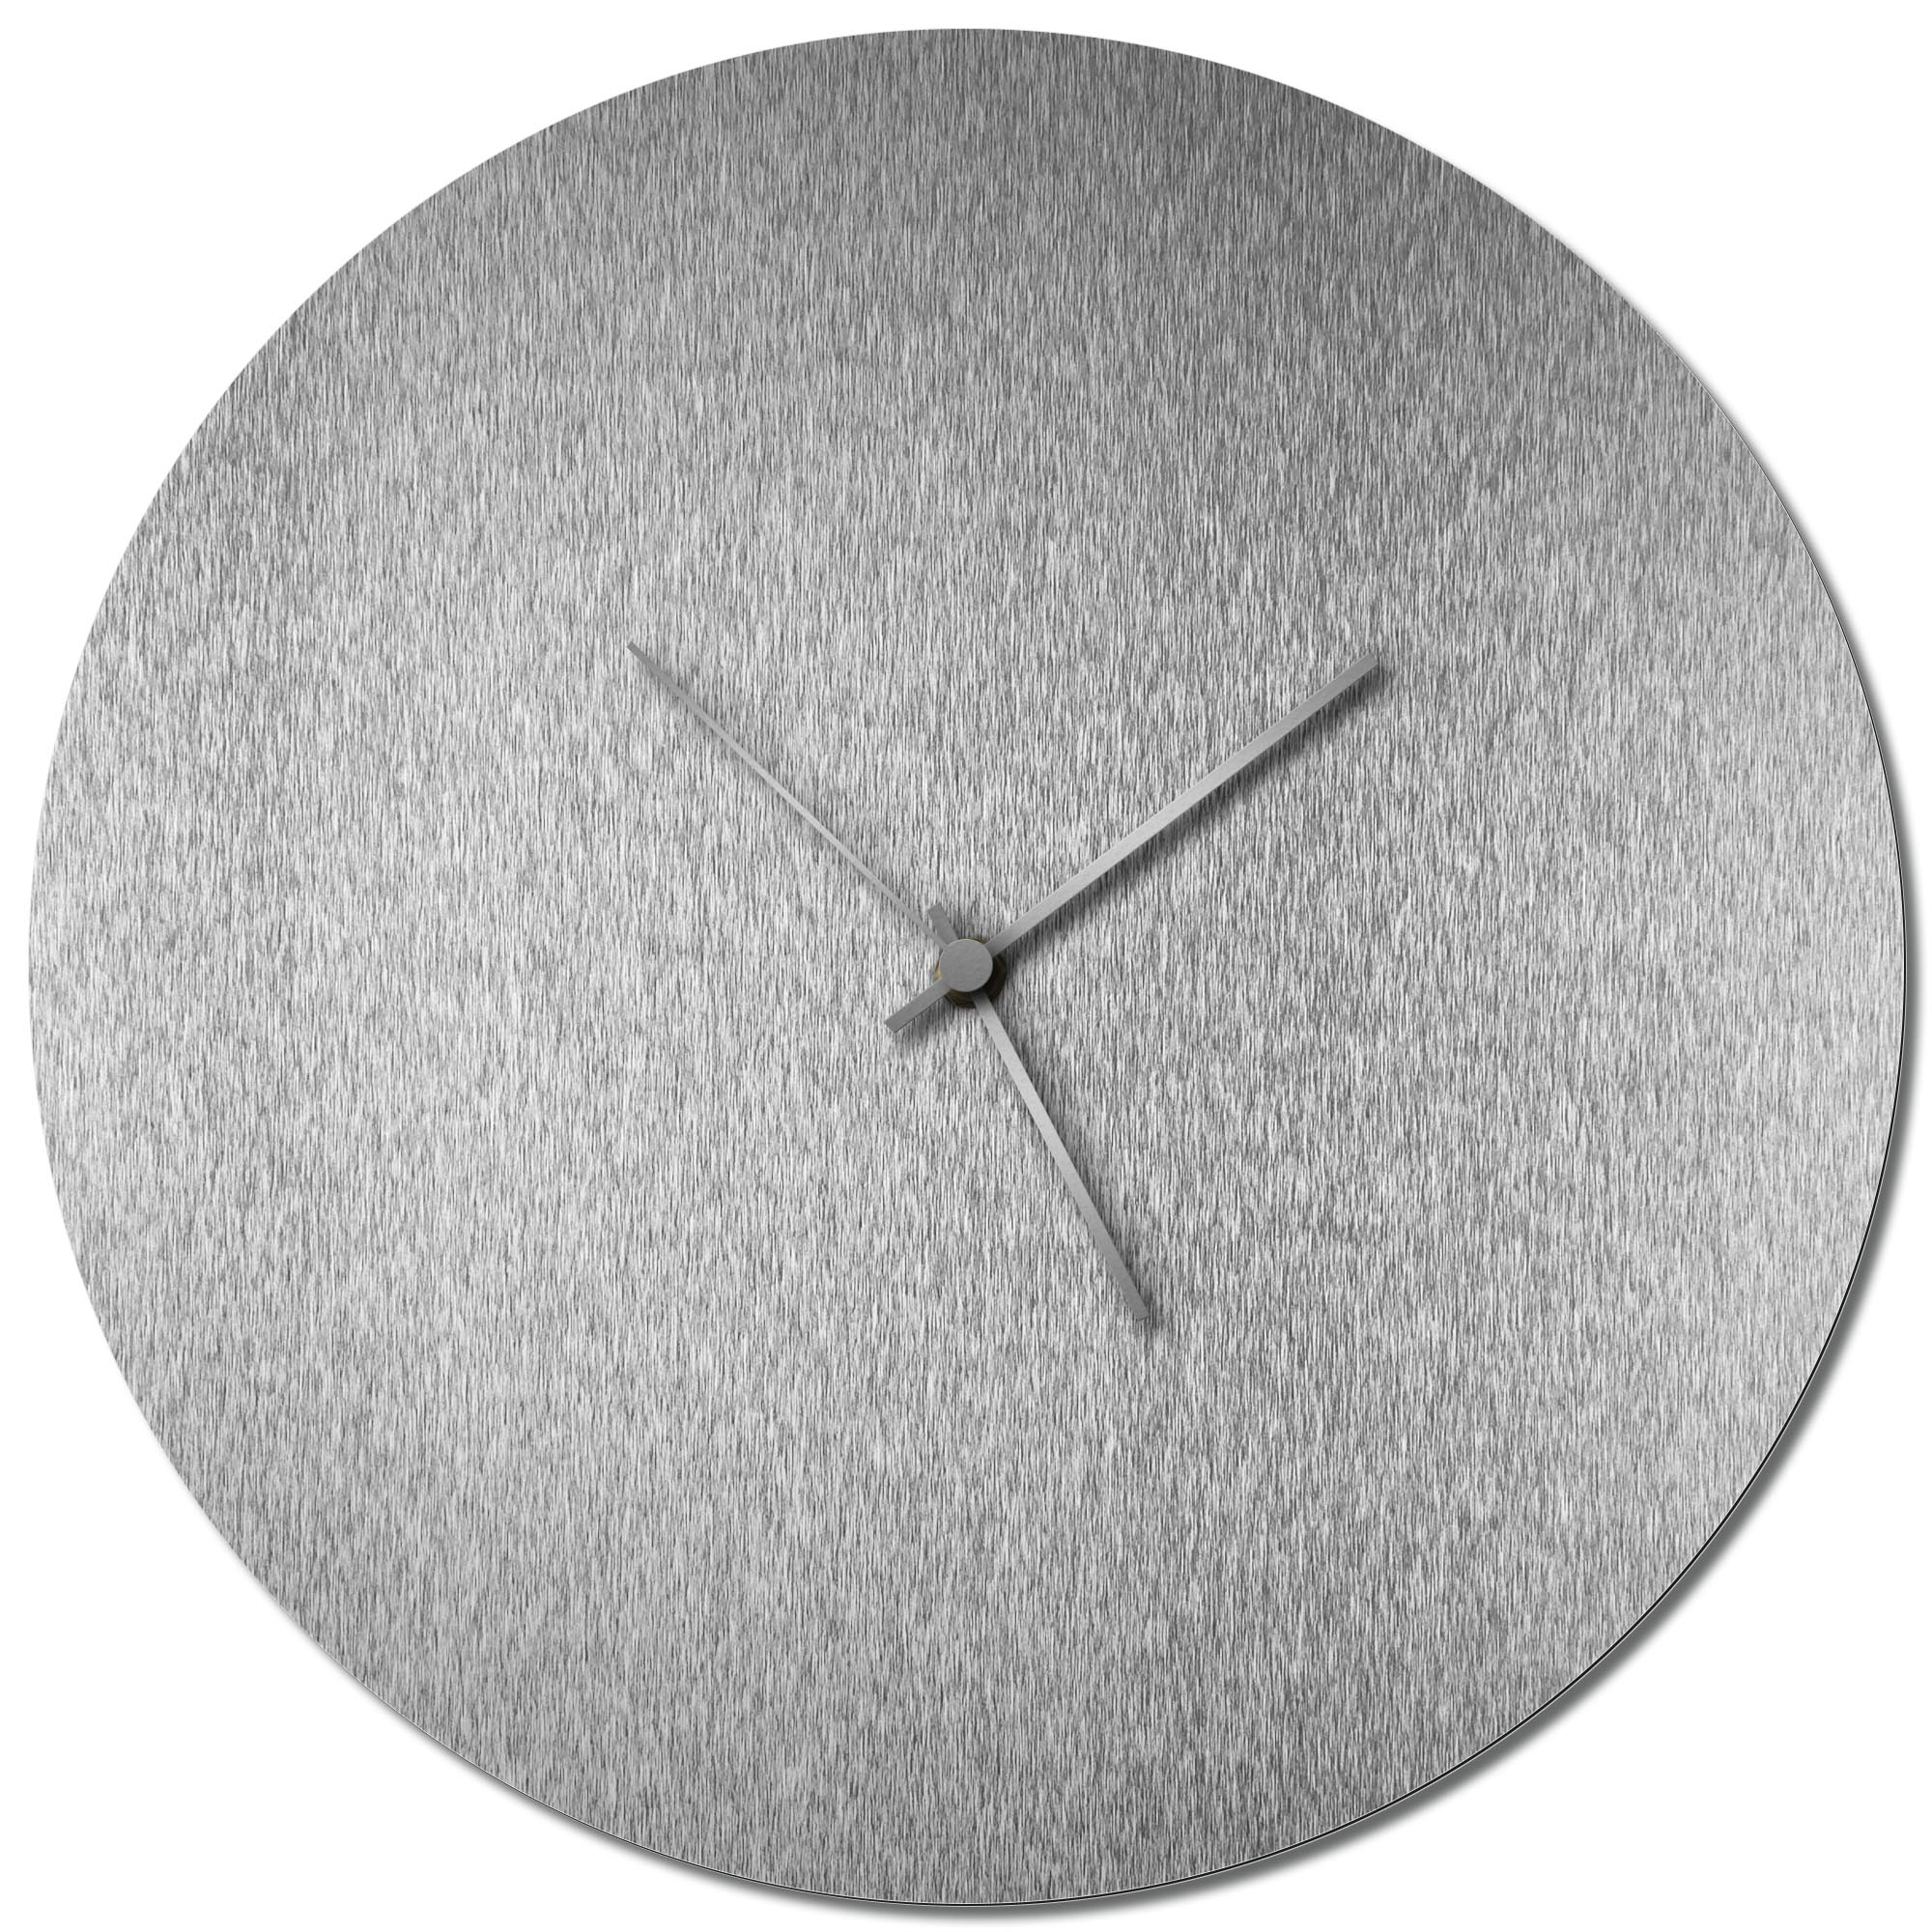 Adam Schwoeppe 'Silversmith Circle Clock Silver' Midcentury Modern Style Wall Clock